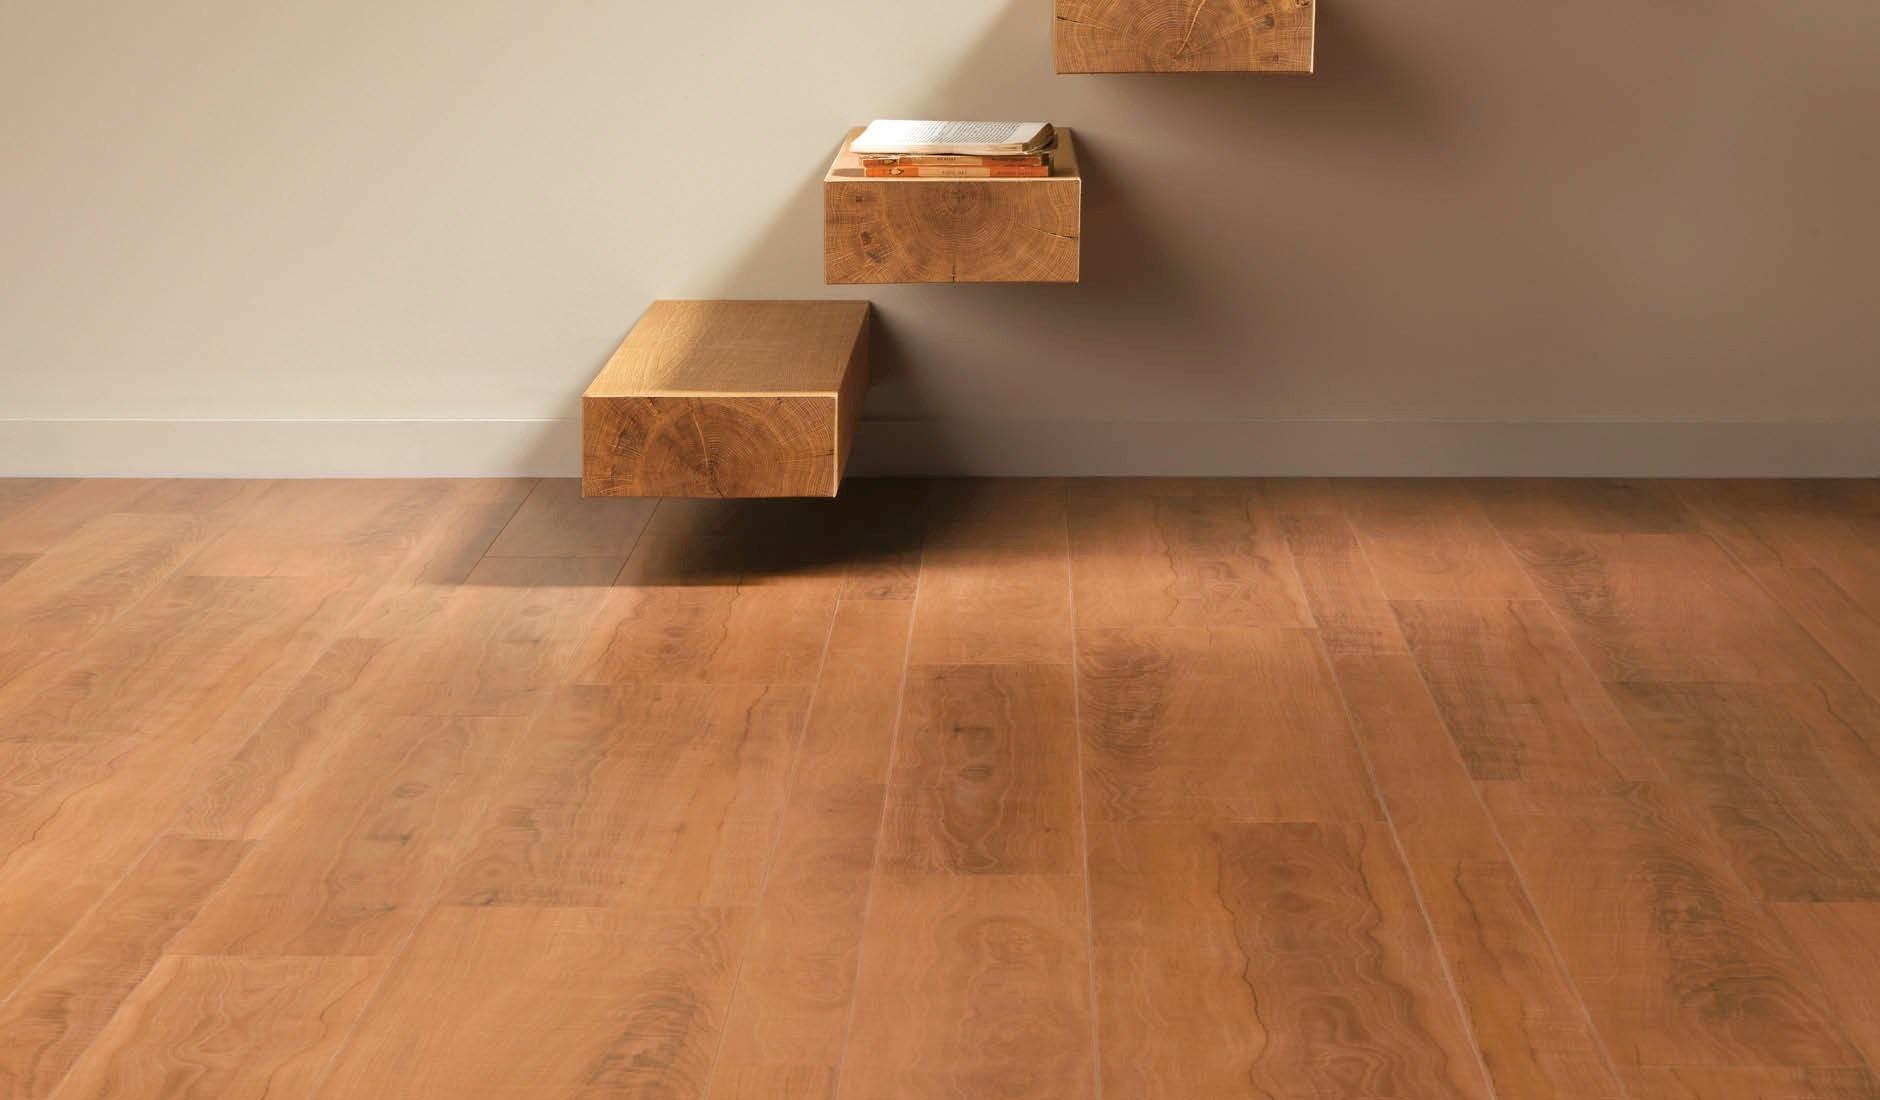 Bel Air Laminate Flooring San Go - Carpet Vidalondon